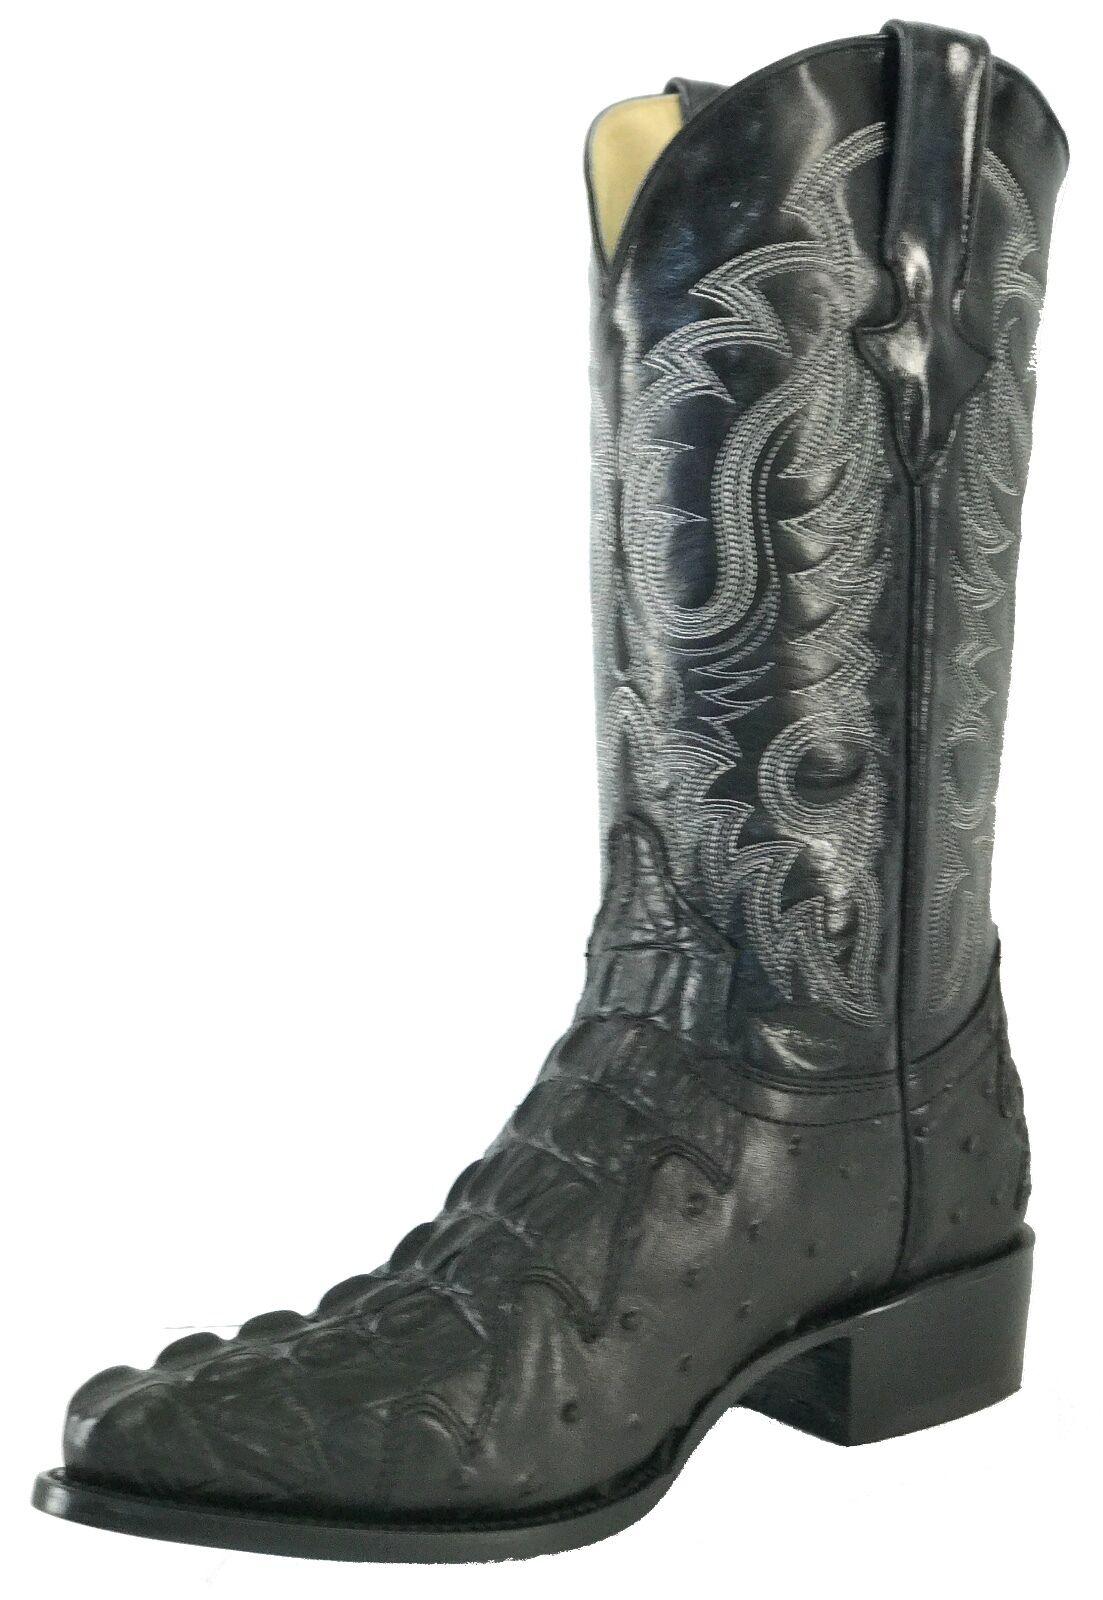 Men's Leather Crocodile Ostrich Design Rodeo Western Cowboy Boots J Toe Black